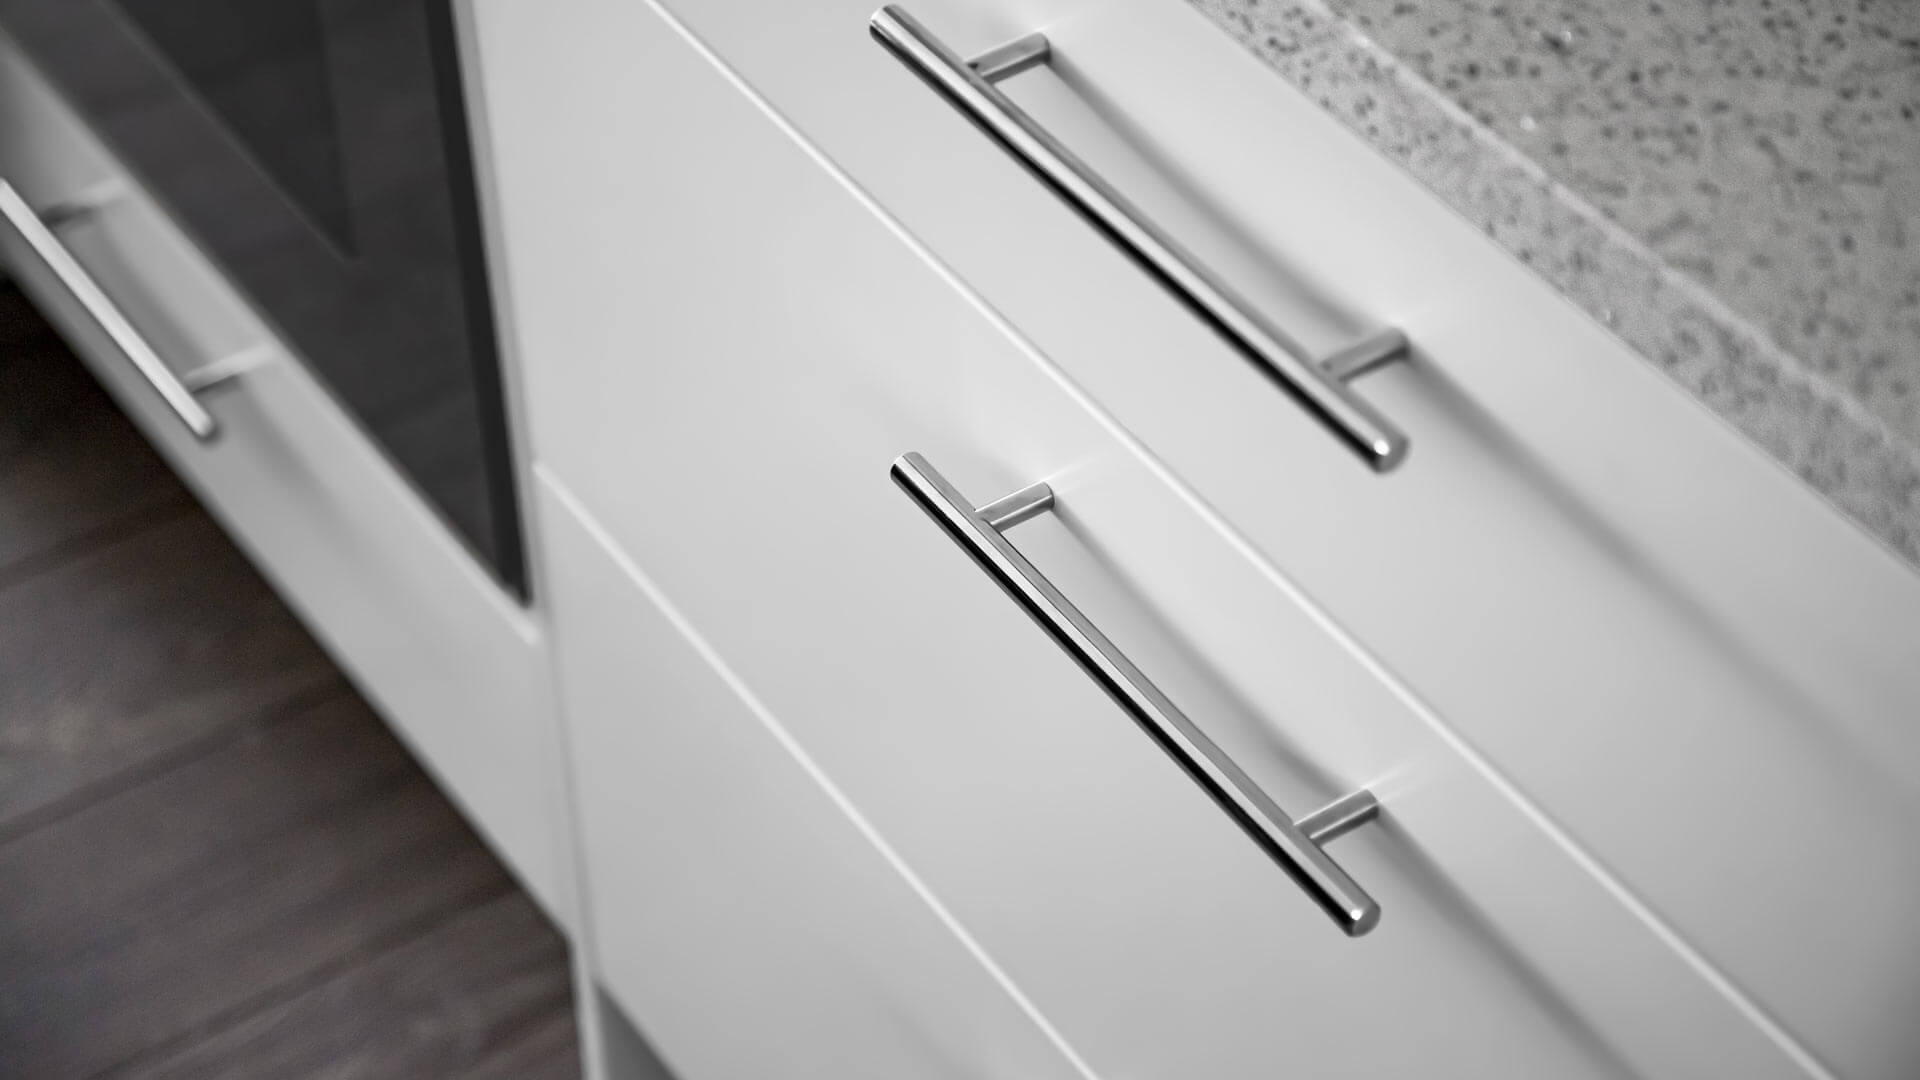 custom white kitchen cabinets wrap kitchen perimeter - Lakeside Modern Cottage (H-LODGE) - Unionville, Indiana, Lake Lemon